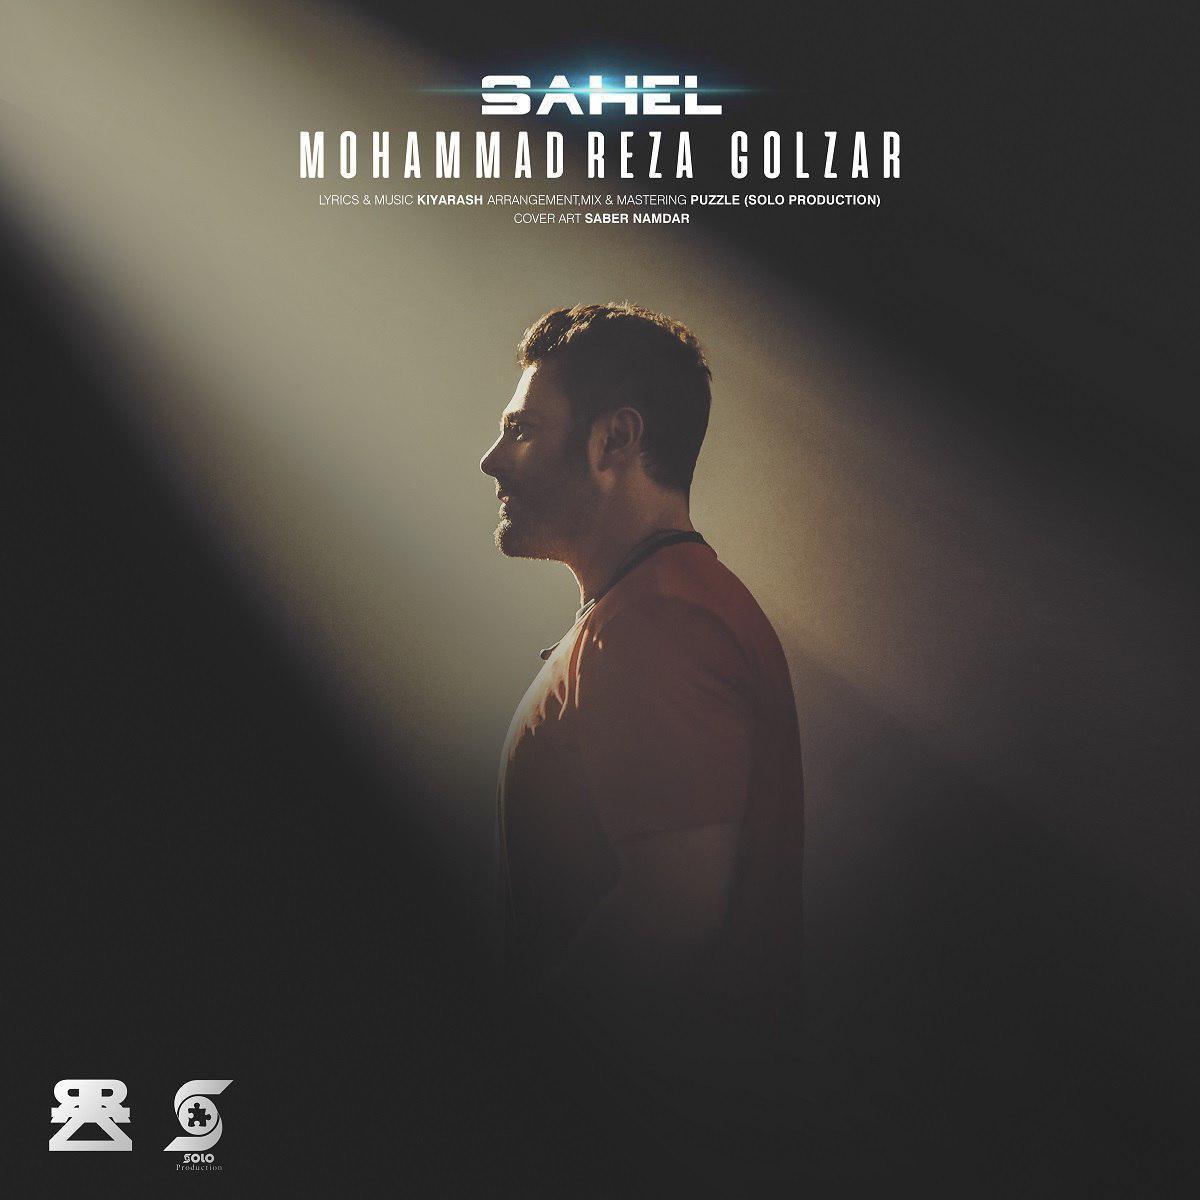 Mohammadreza Golzar - Sahel - دانلود آهنگ محمدرضا گلزار به نام ساحل